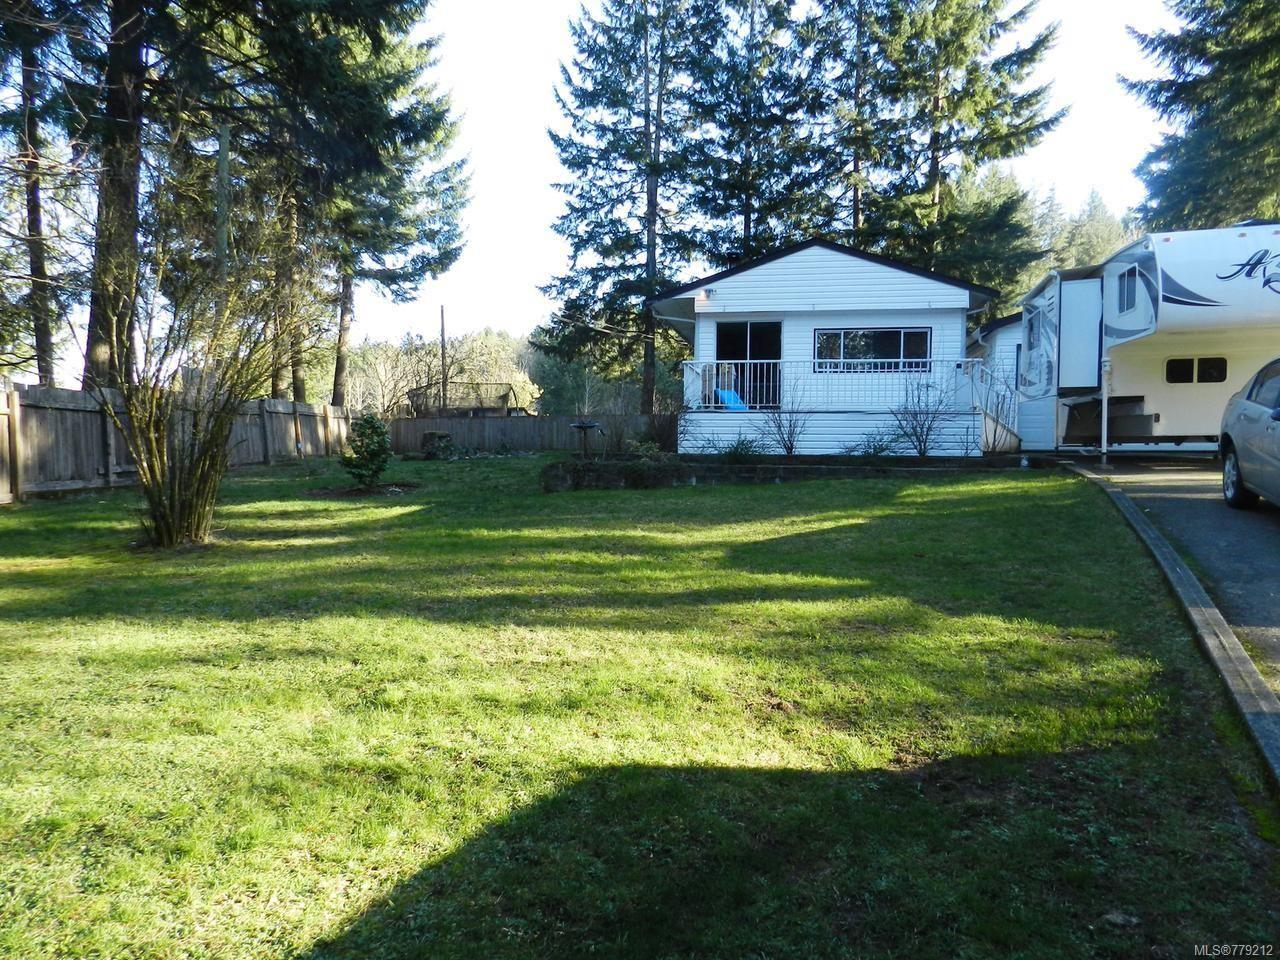 Main Photo: 13535 CEDAR ROAD in NANAIMO: Na Cedar Manufactured Home for sale (Nanaimo)  : MLS®# 779212